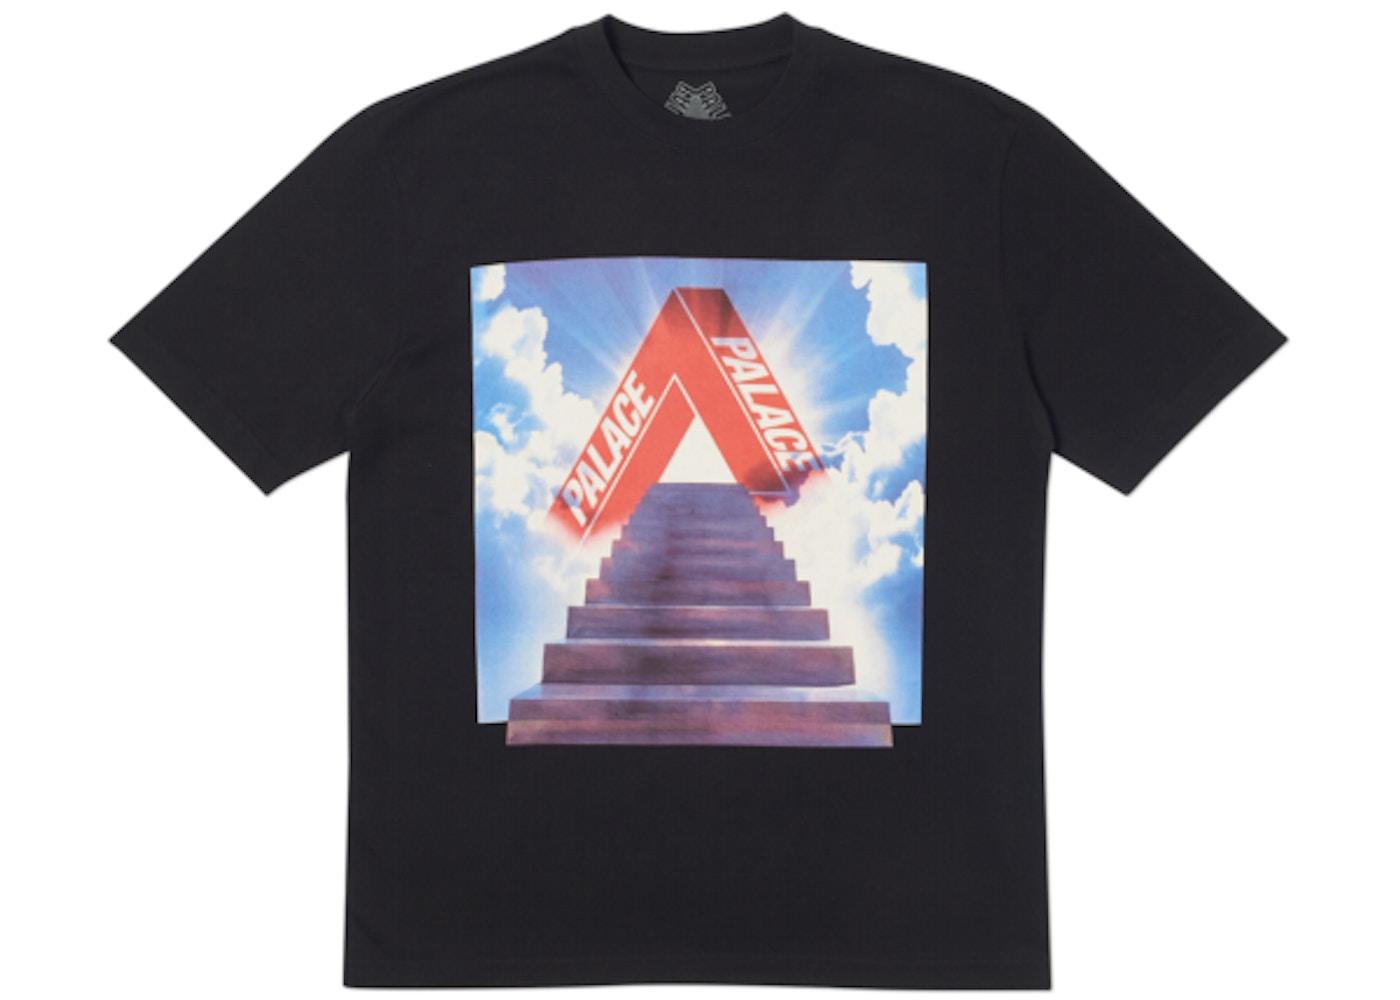 1d5db317 Palace Tri-Ternity T-Shirt Black - SS19